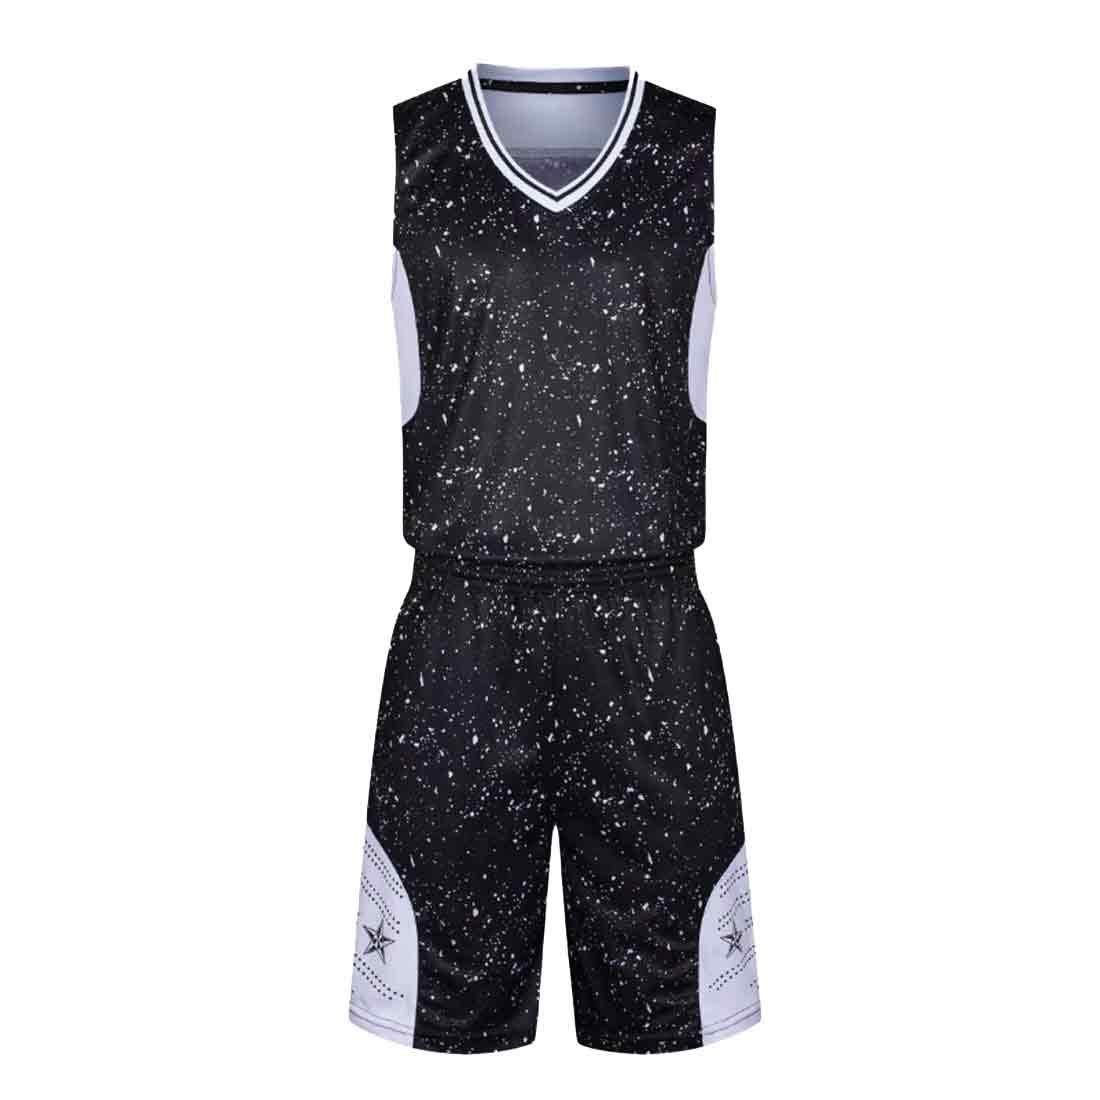 Yefree Herren Camouflage Basketball Sweatshirt Basketball Kleidung Set Trainingshose Sport Set Jersey und Kurze Basketball Jersey Set